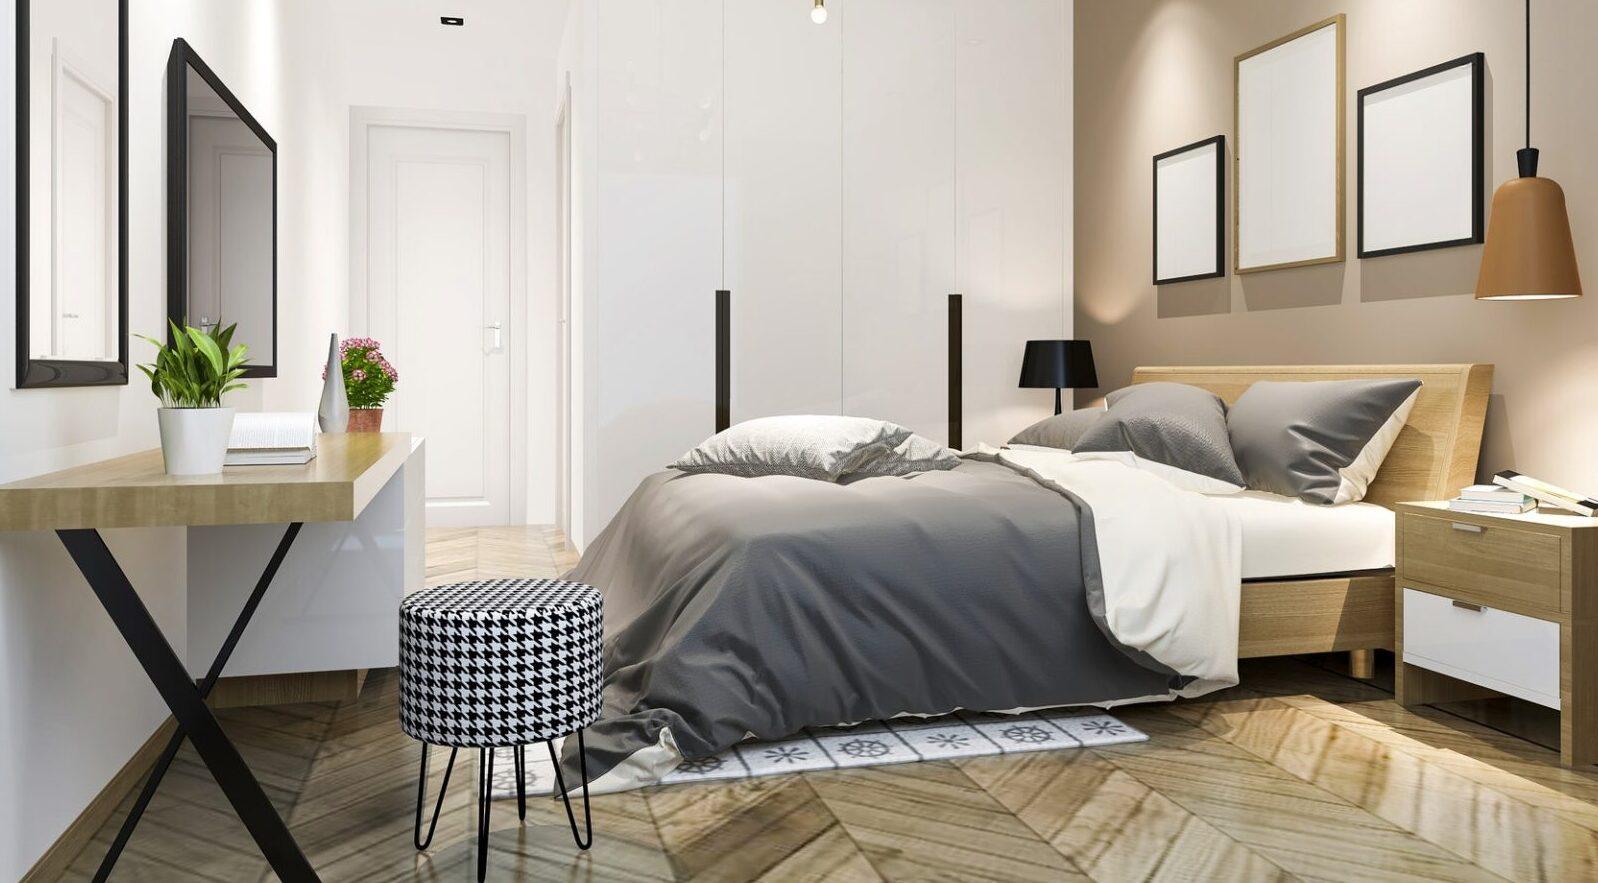 3d-rendering-beautiful-luxury-bedroom-suite-in-hotel-with-tv-1.jpg